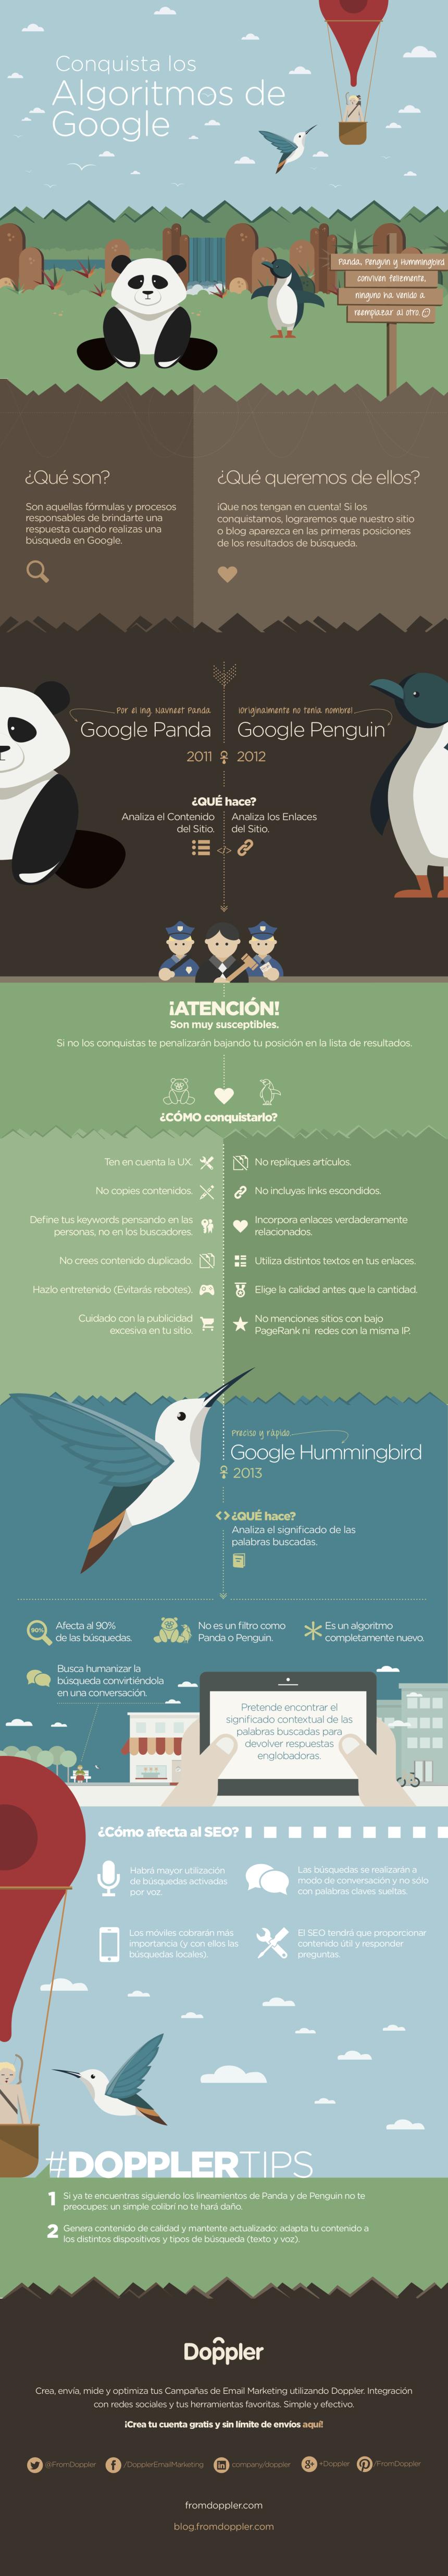 algoritmos google - infografia